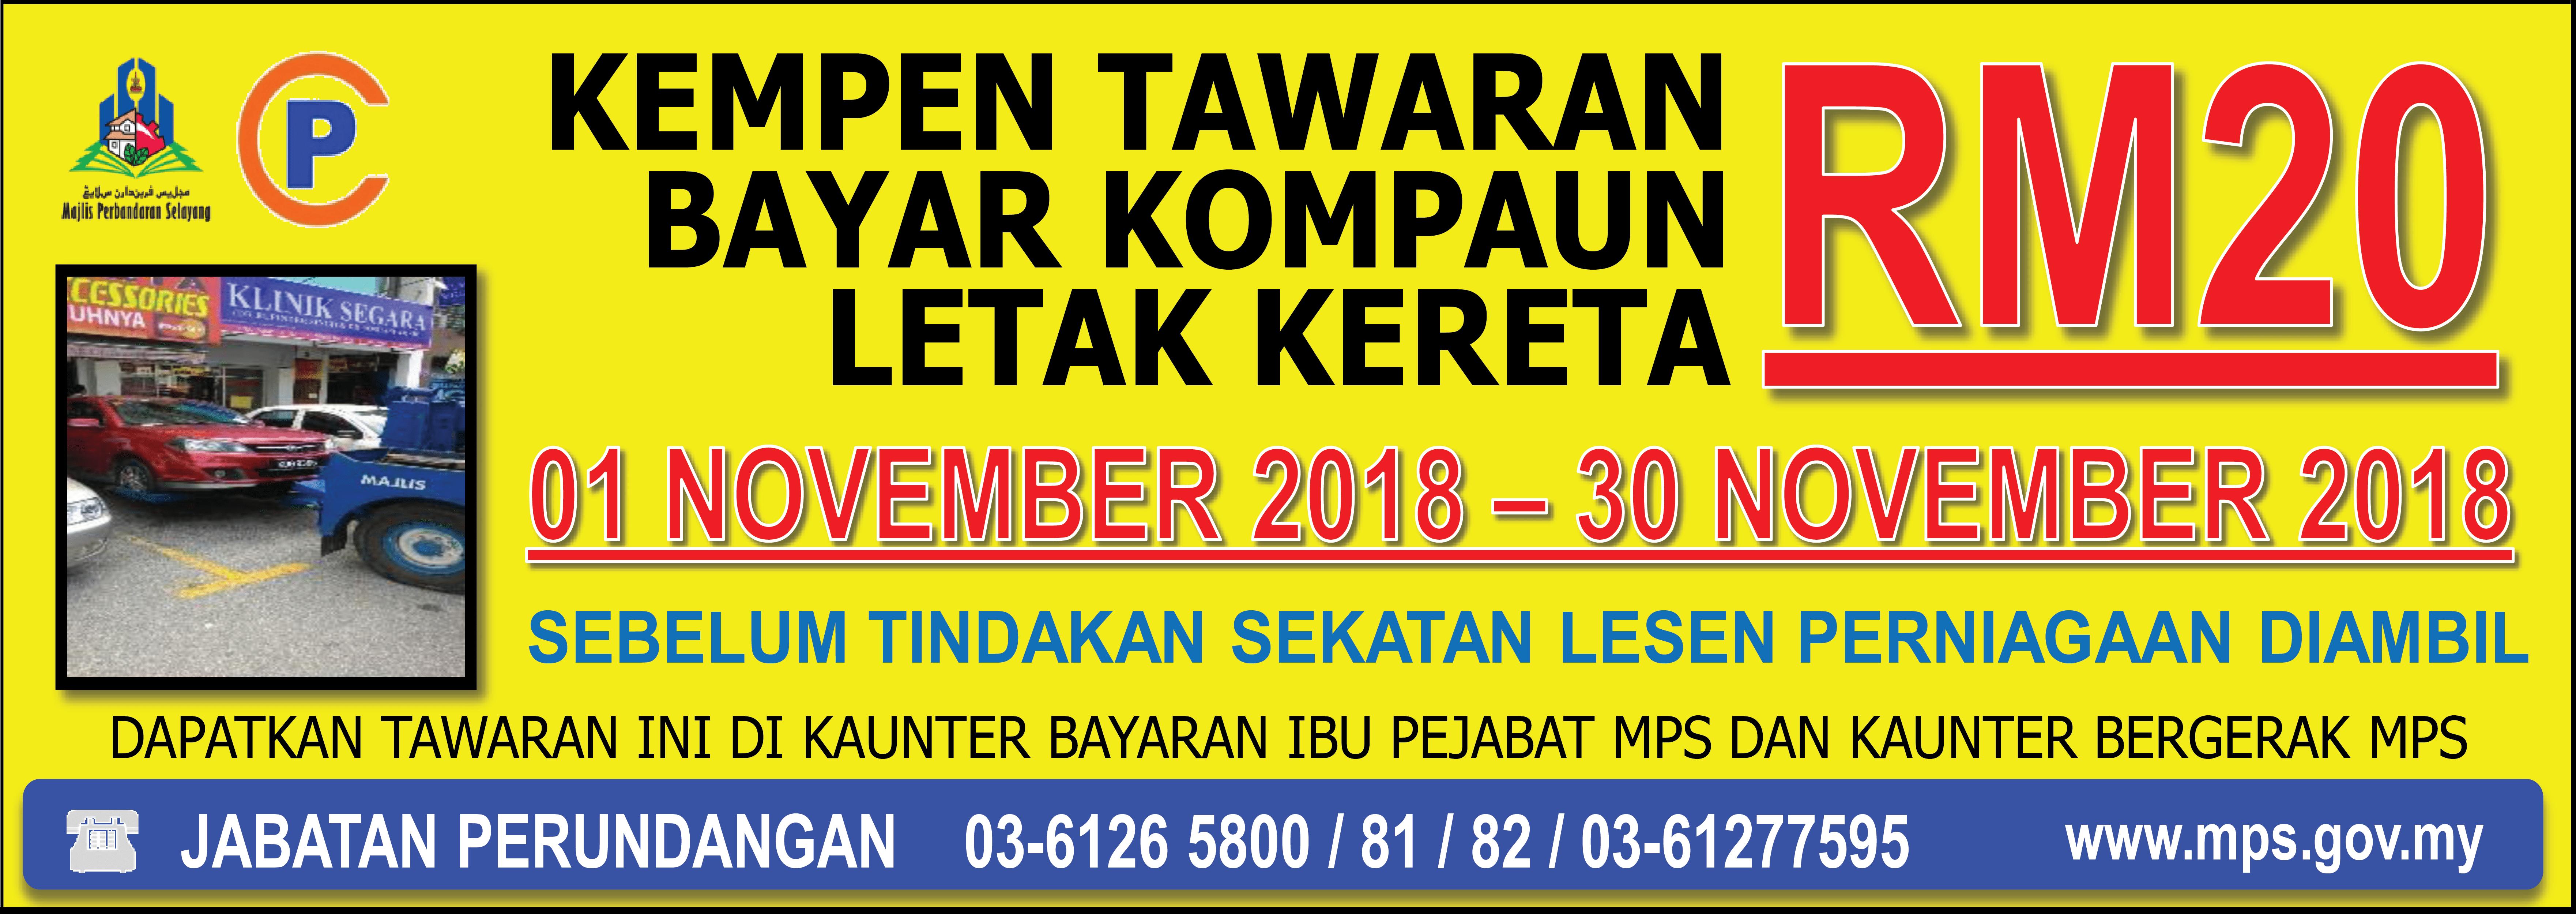 kempen-selayang-2018-e1540978953114